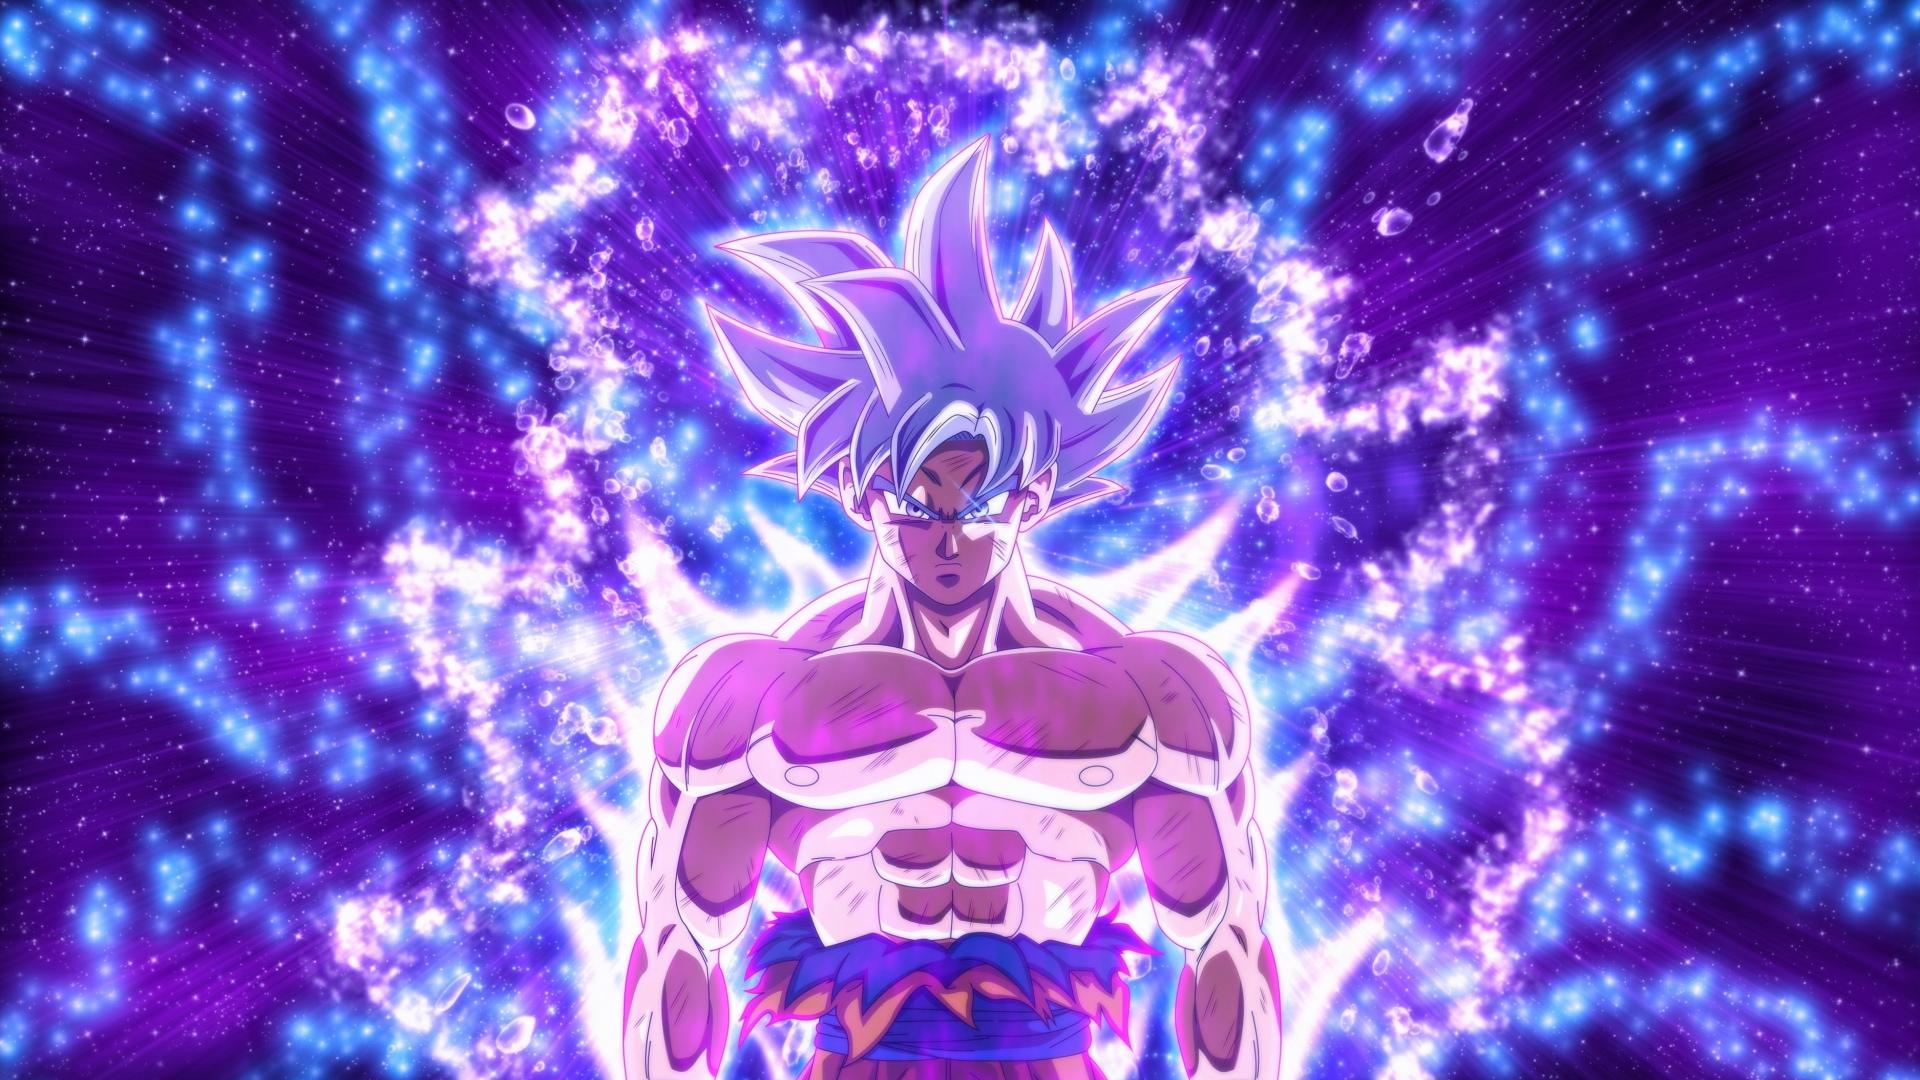 Download 1920x1080 Wallpaper Ultra Instinct Goku Dragon Ball